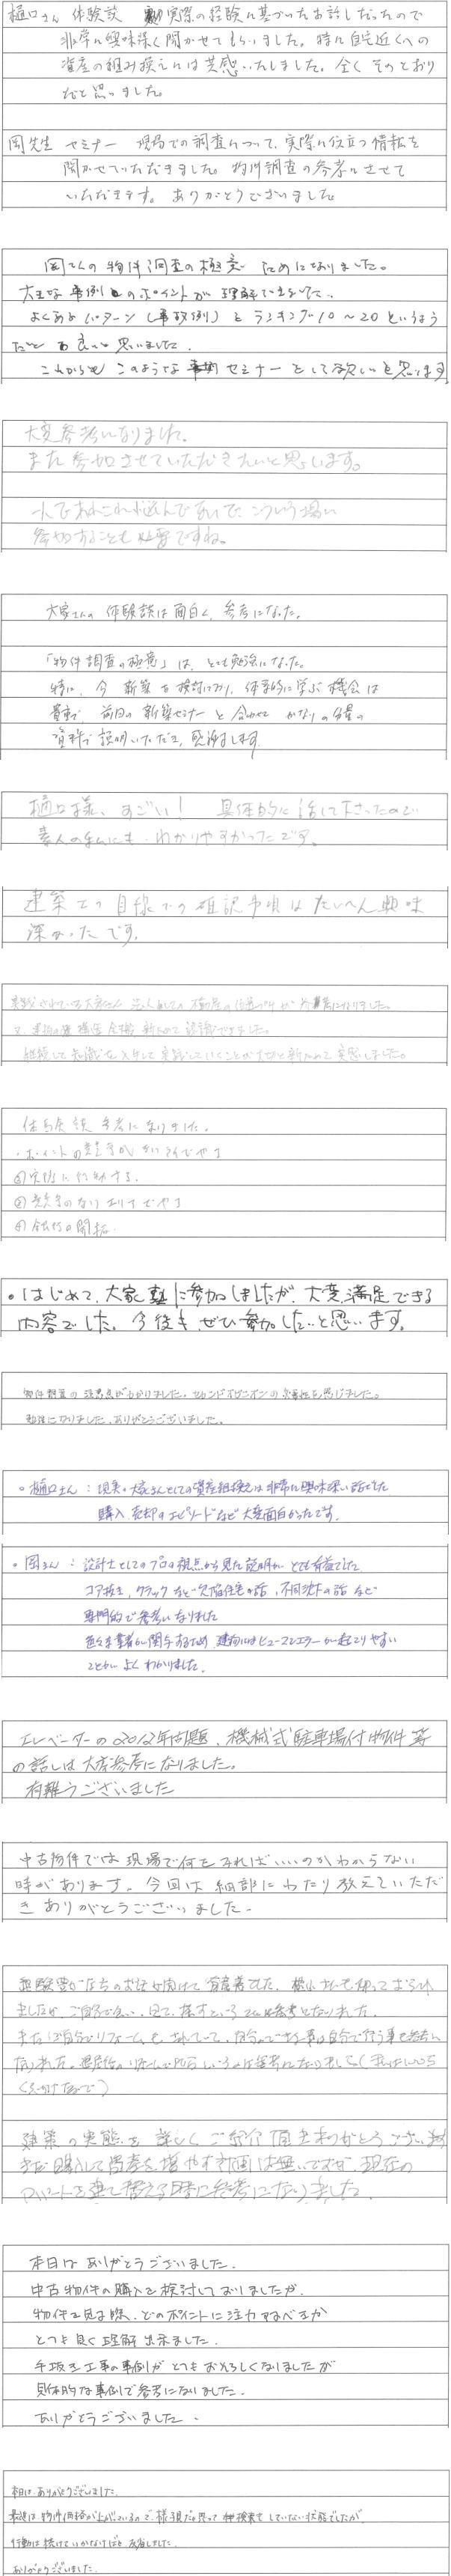 kanso_2014_03_30_small.jpg